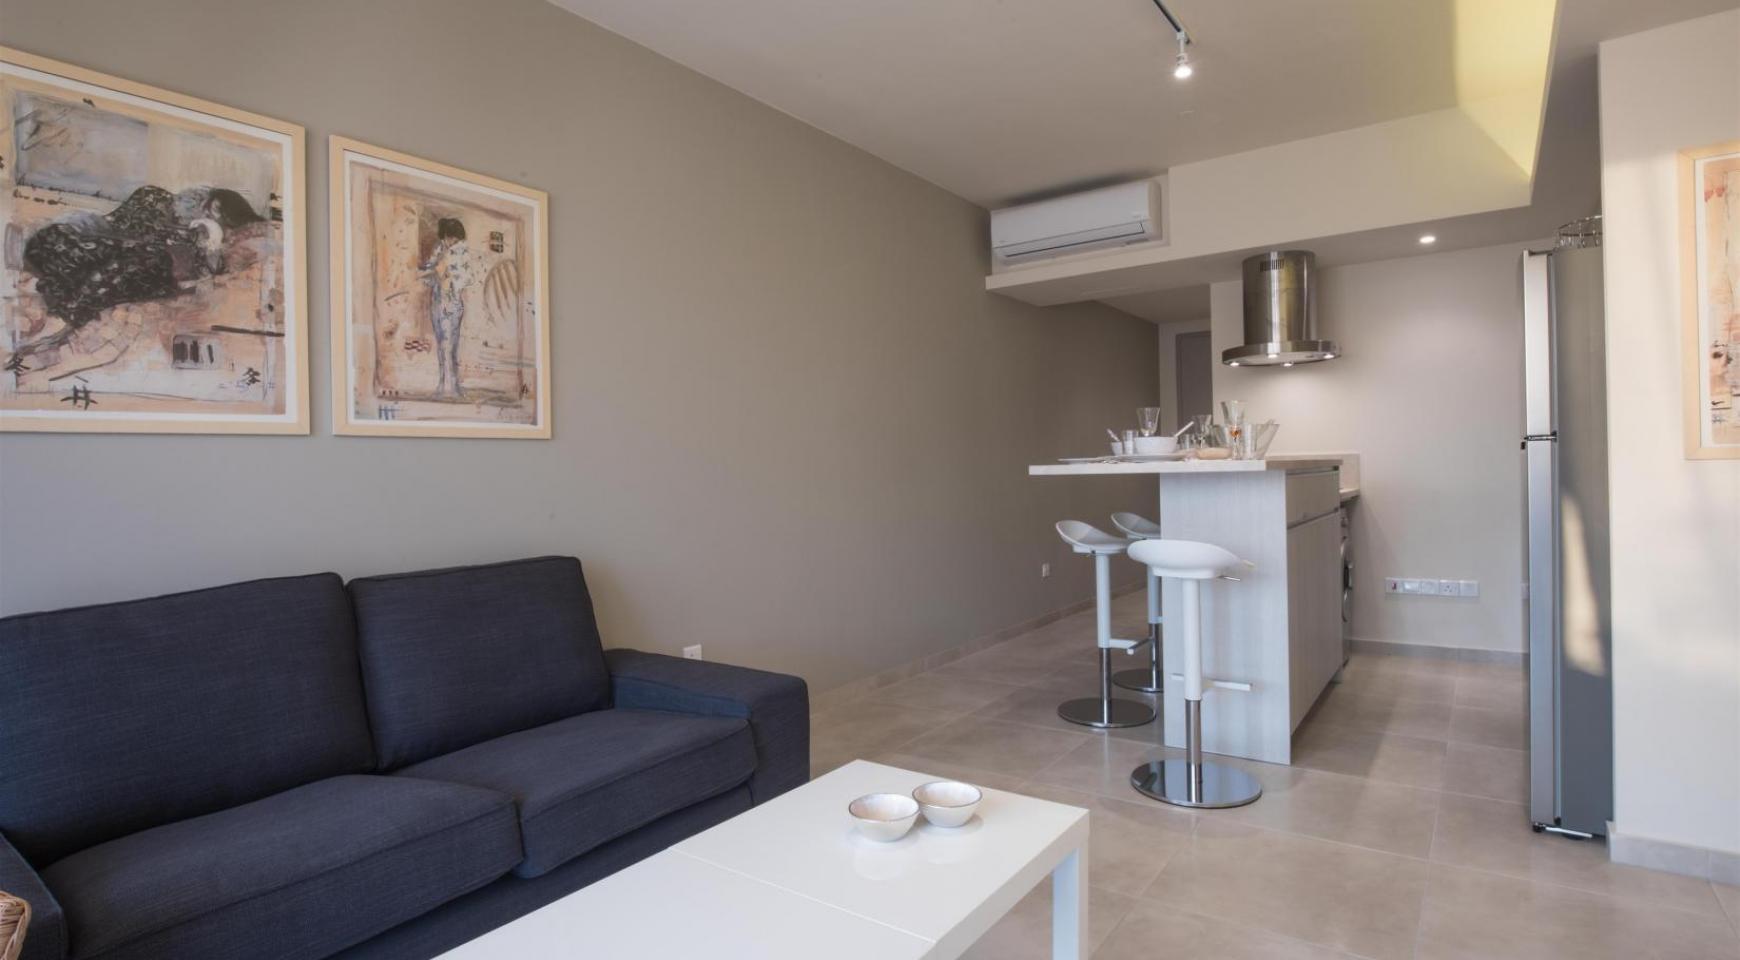 New 2 Bedroom Apartment in Kapparis Area - 2